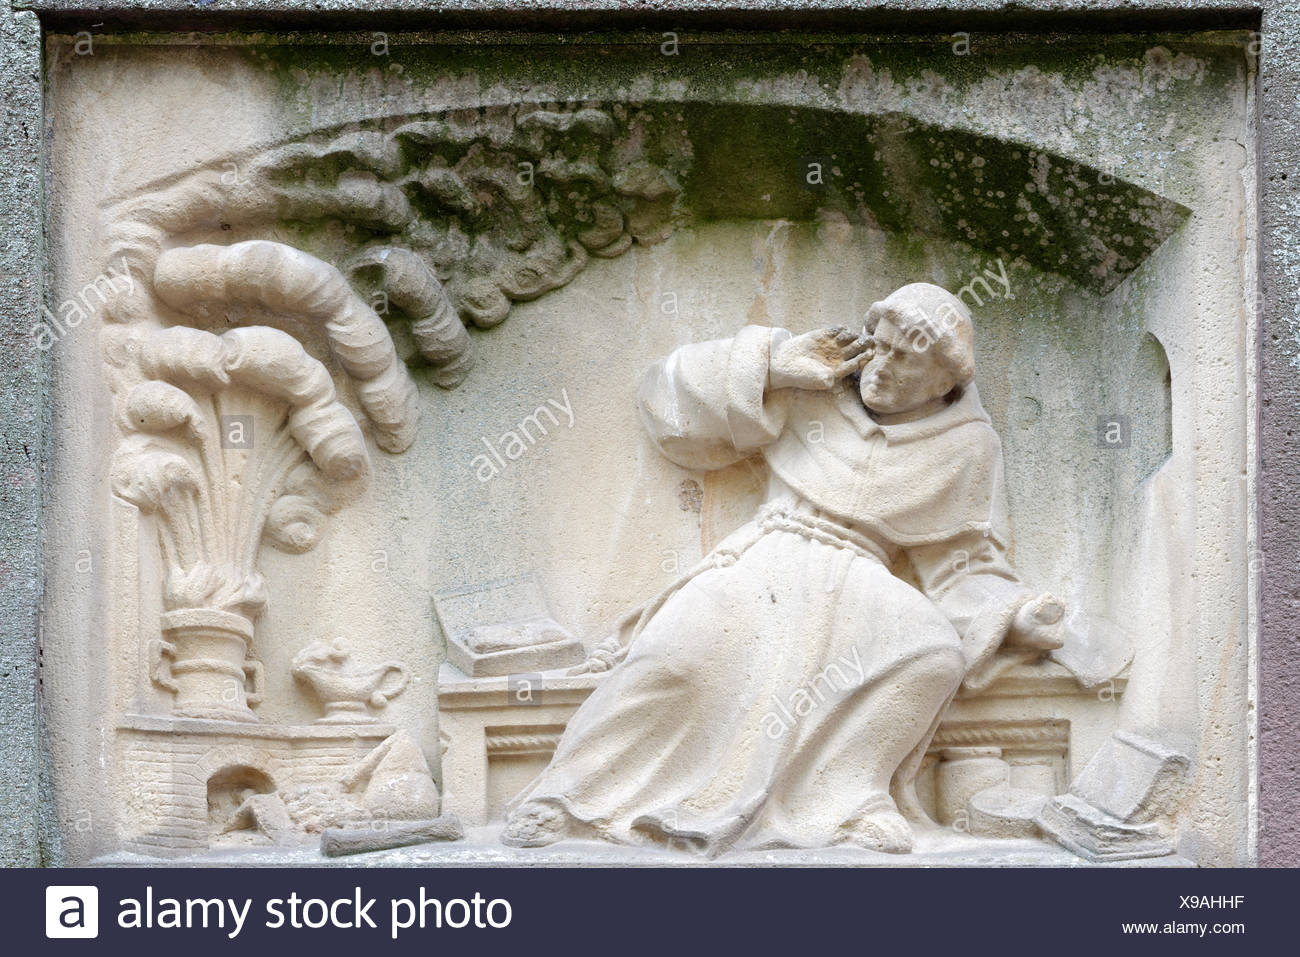 Relief of Berthold Schwarz, inventor of gunpowder, Berthold Schwarz Fountain by Josef Alois Knittel, 1855, Freiburg im Breisgau - Stock Image